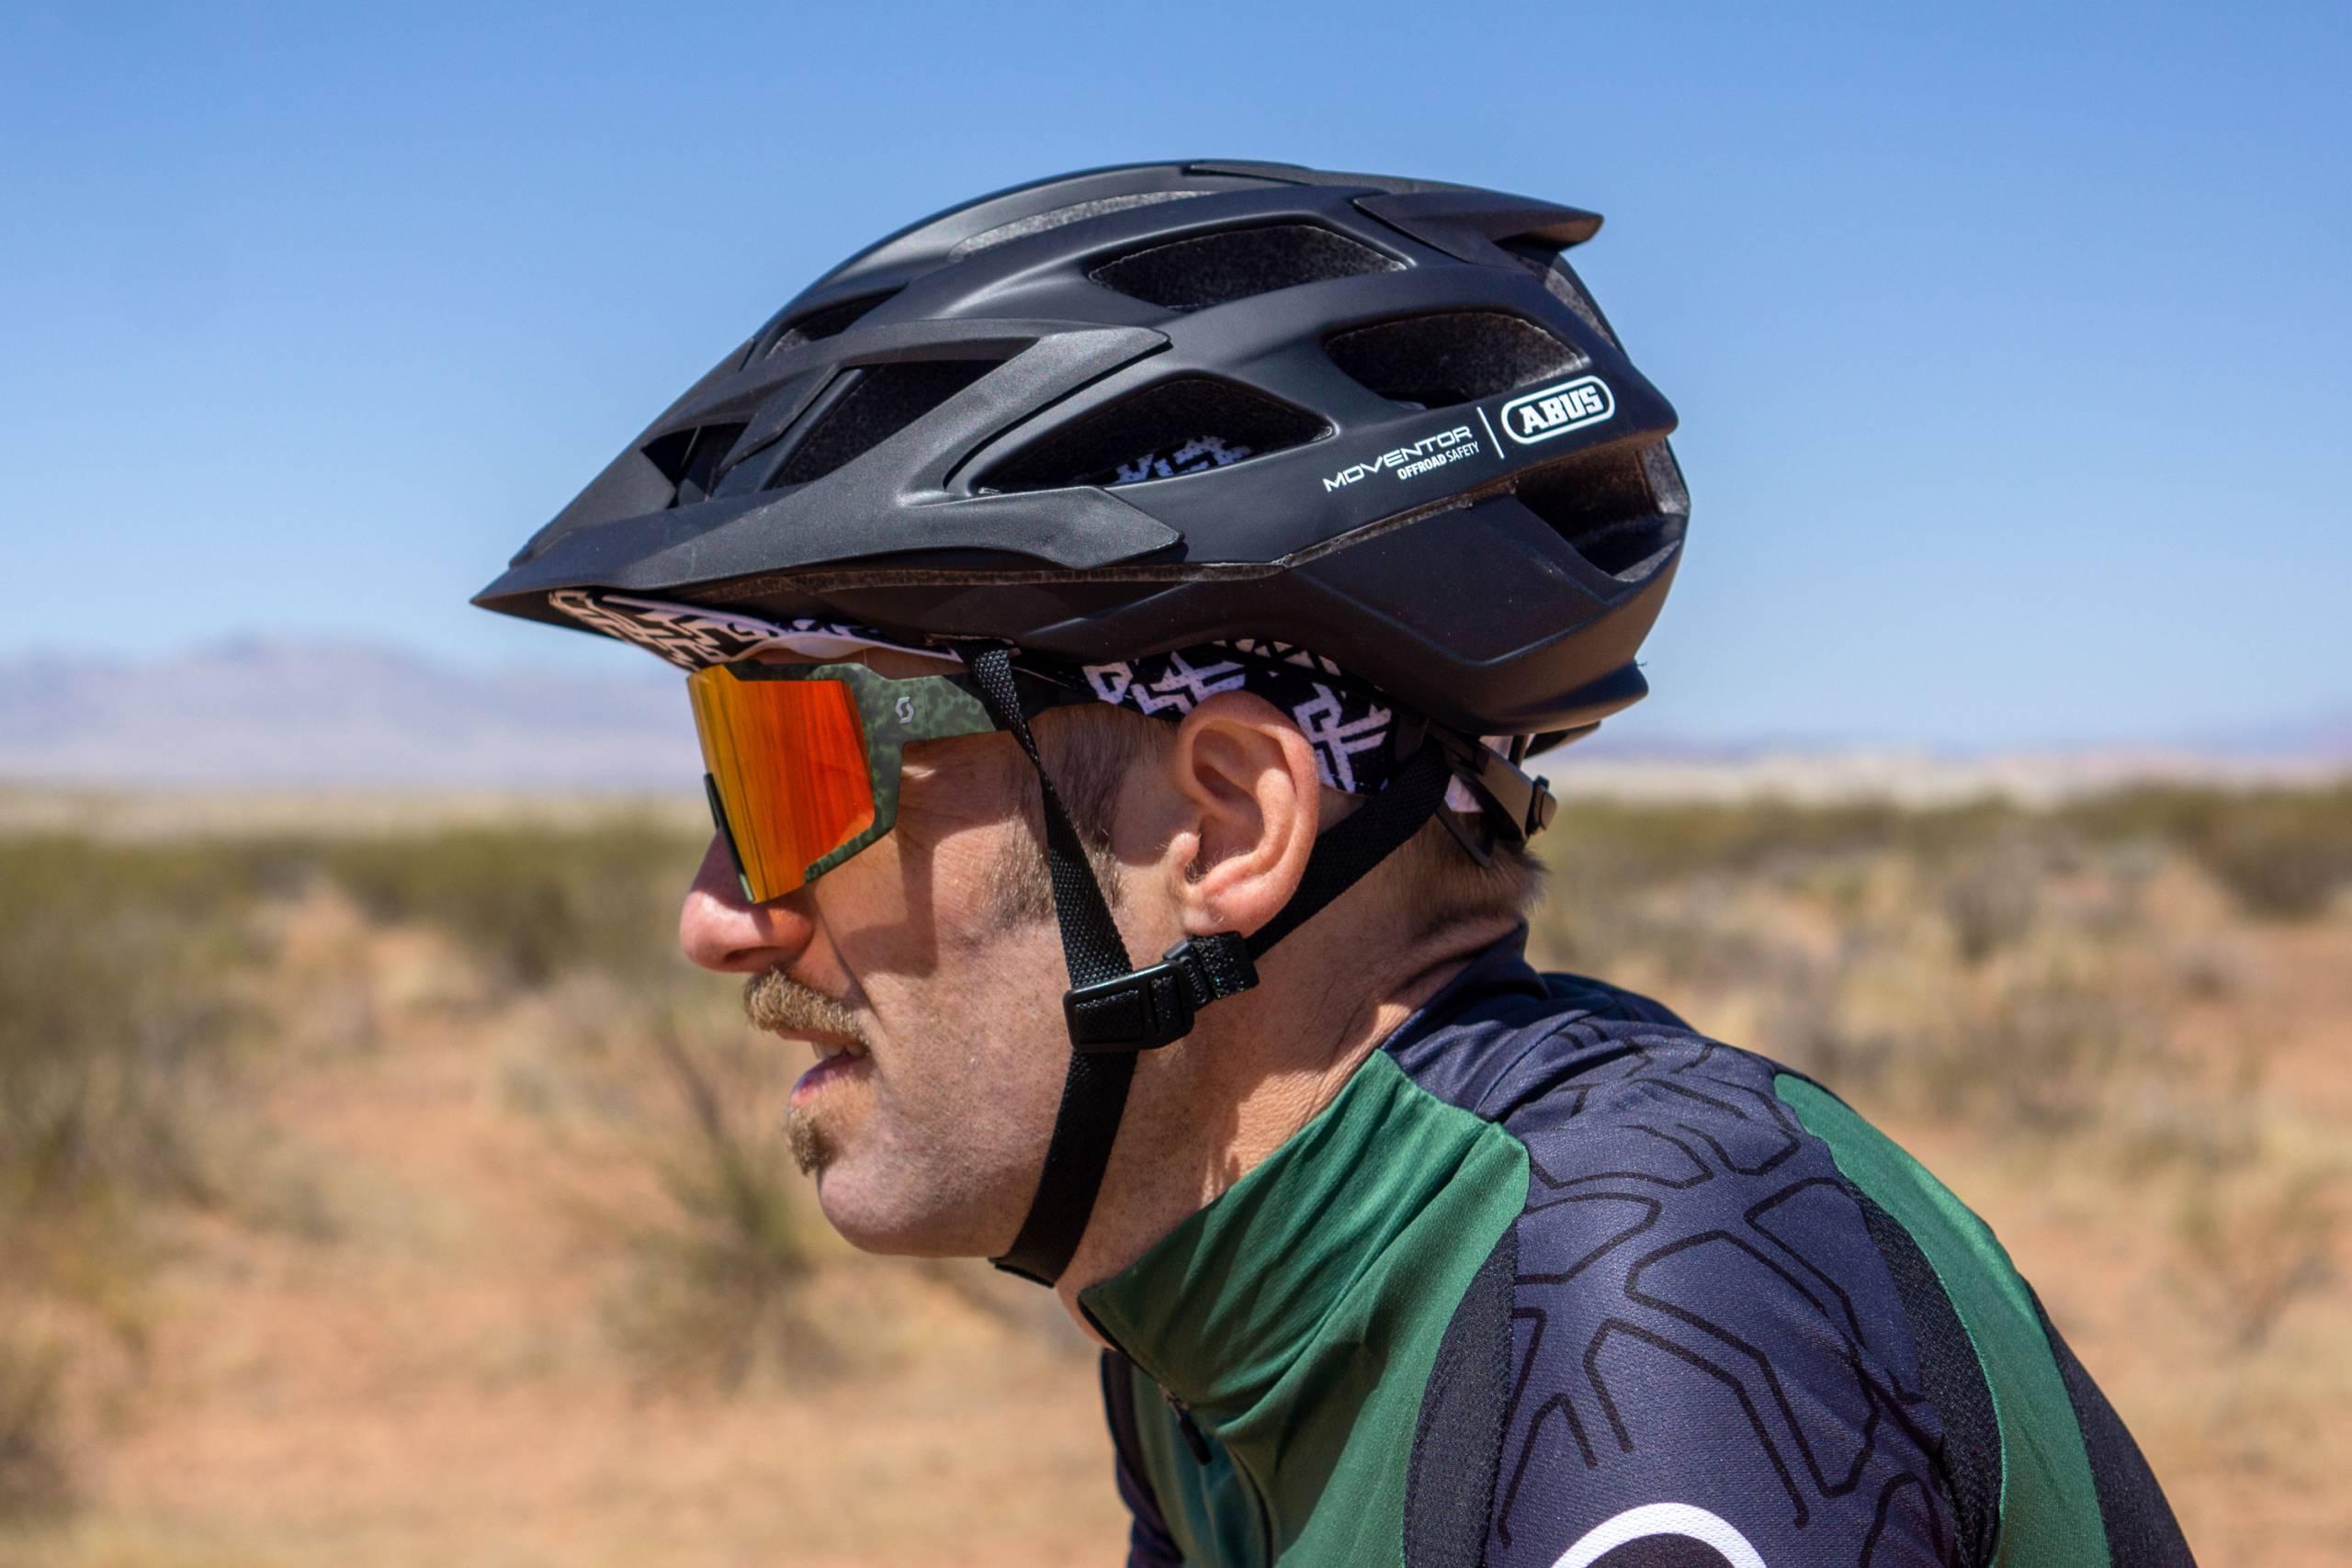 ABUS Moventor helmet